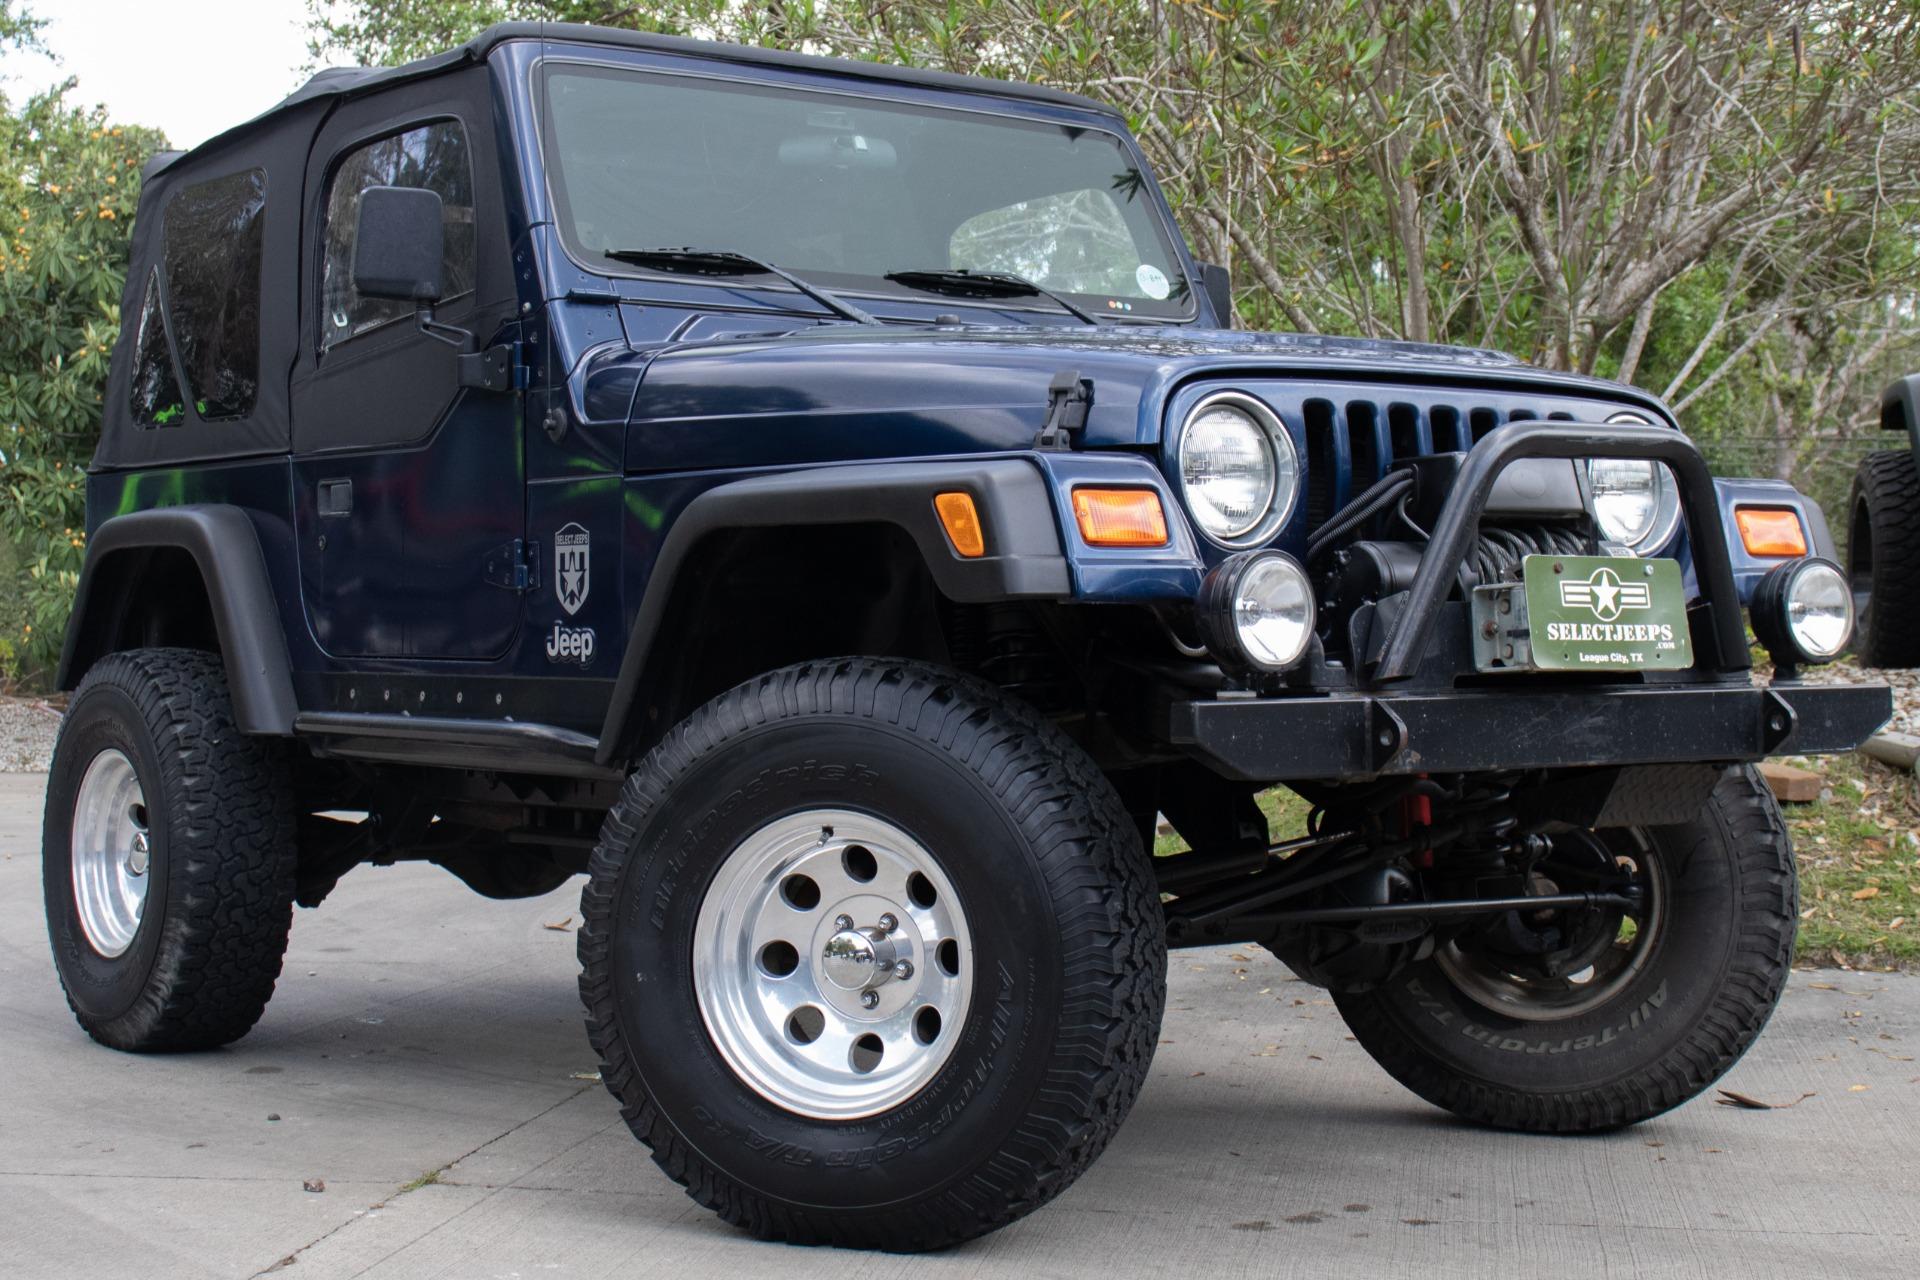 Used-2001-Jeep-Wrangler-2dr-SE